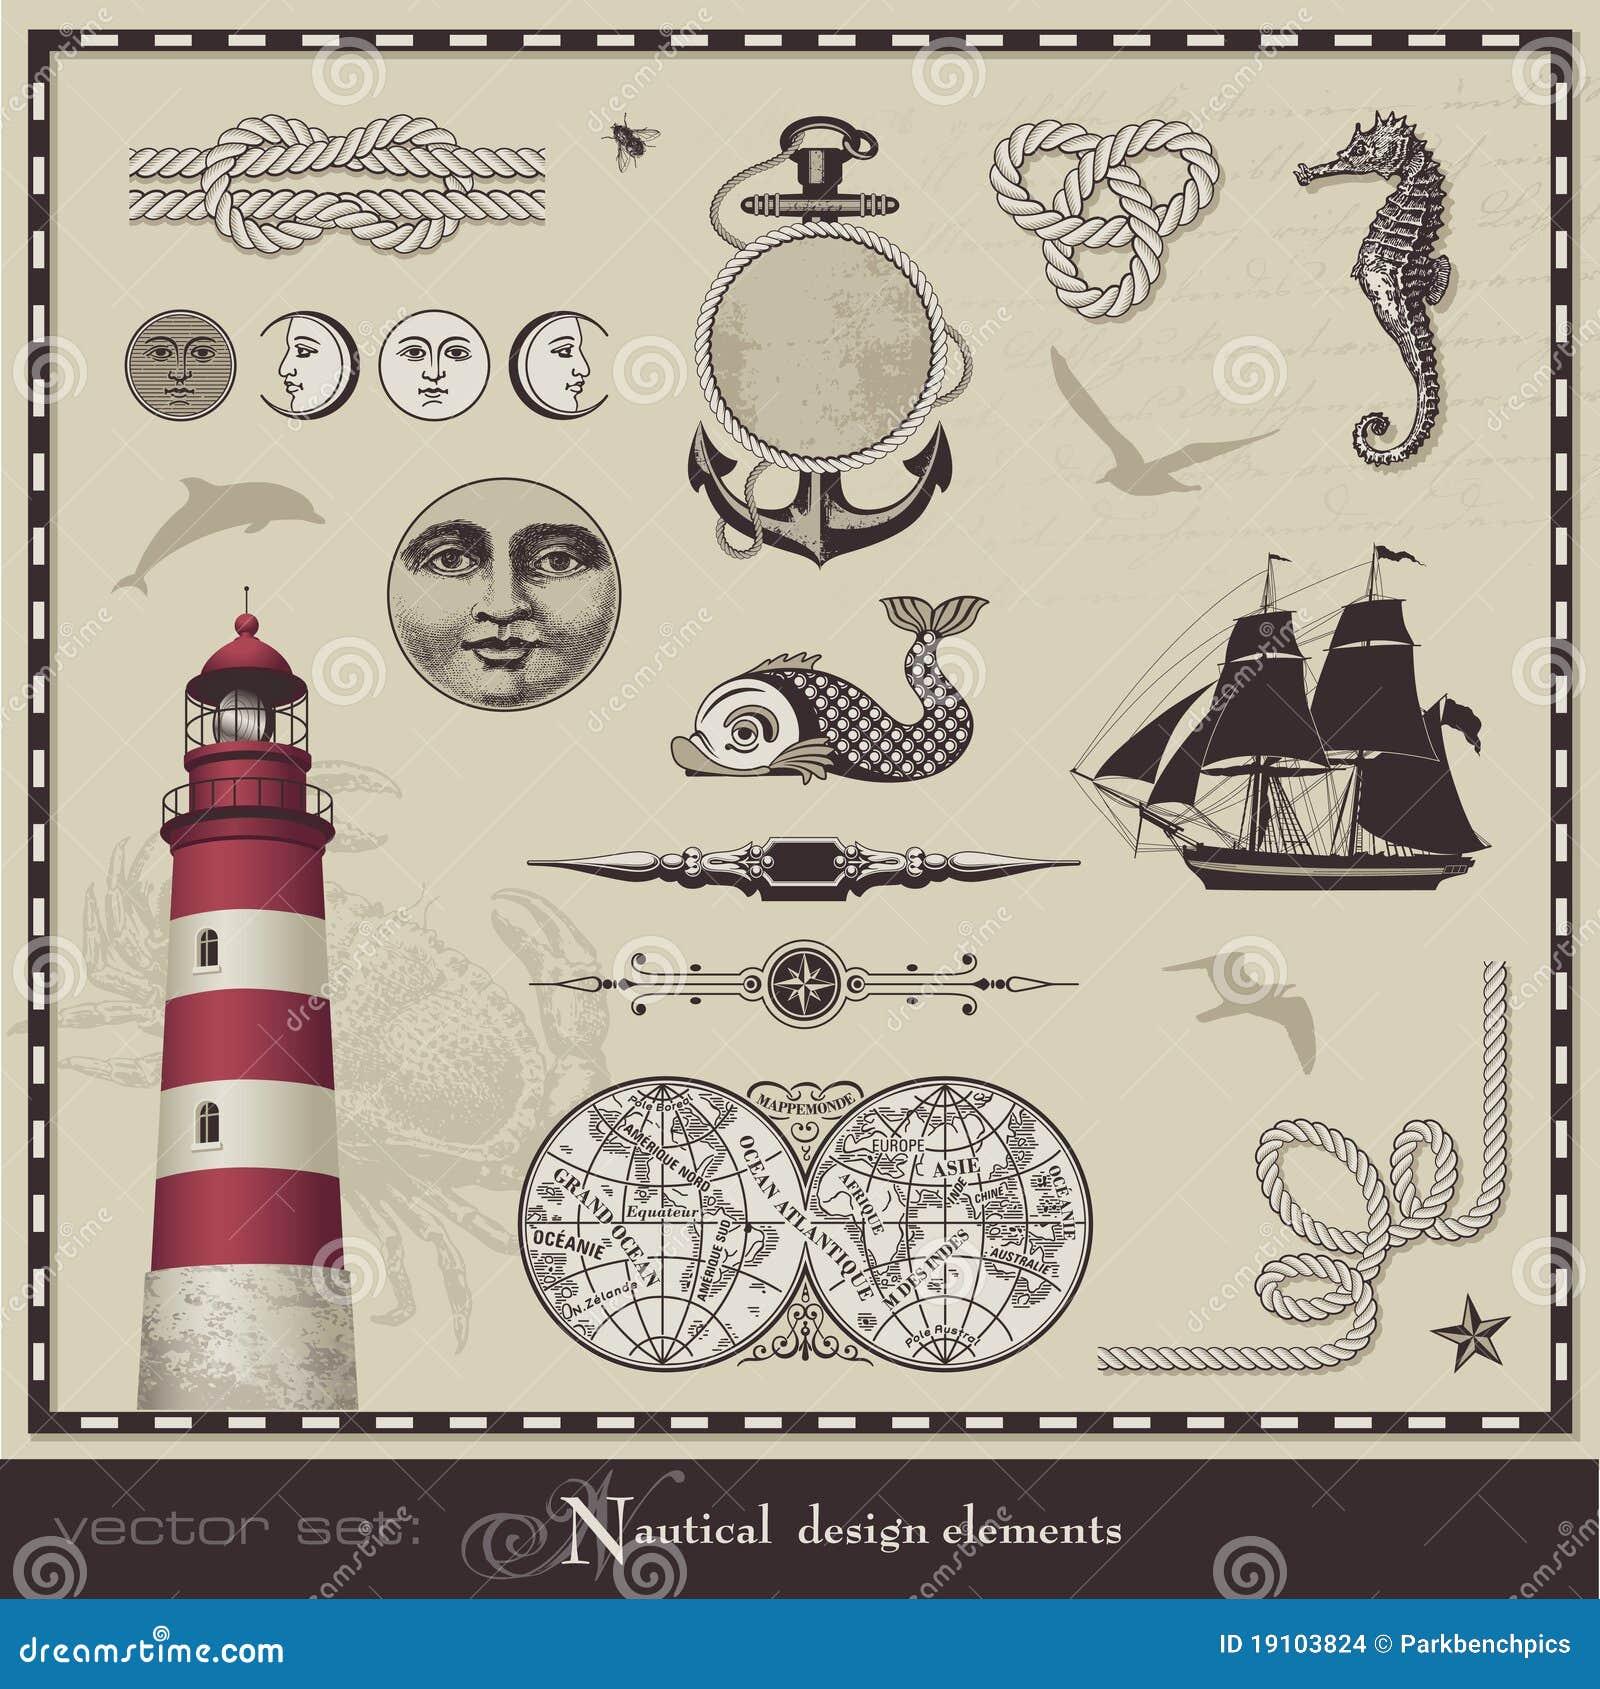 Key Elements Of Nautical Style: Nautical Design Elements Stock Vector. Image Of Design